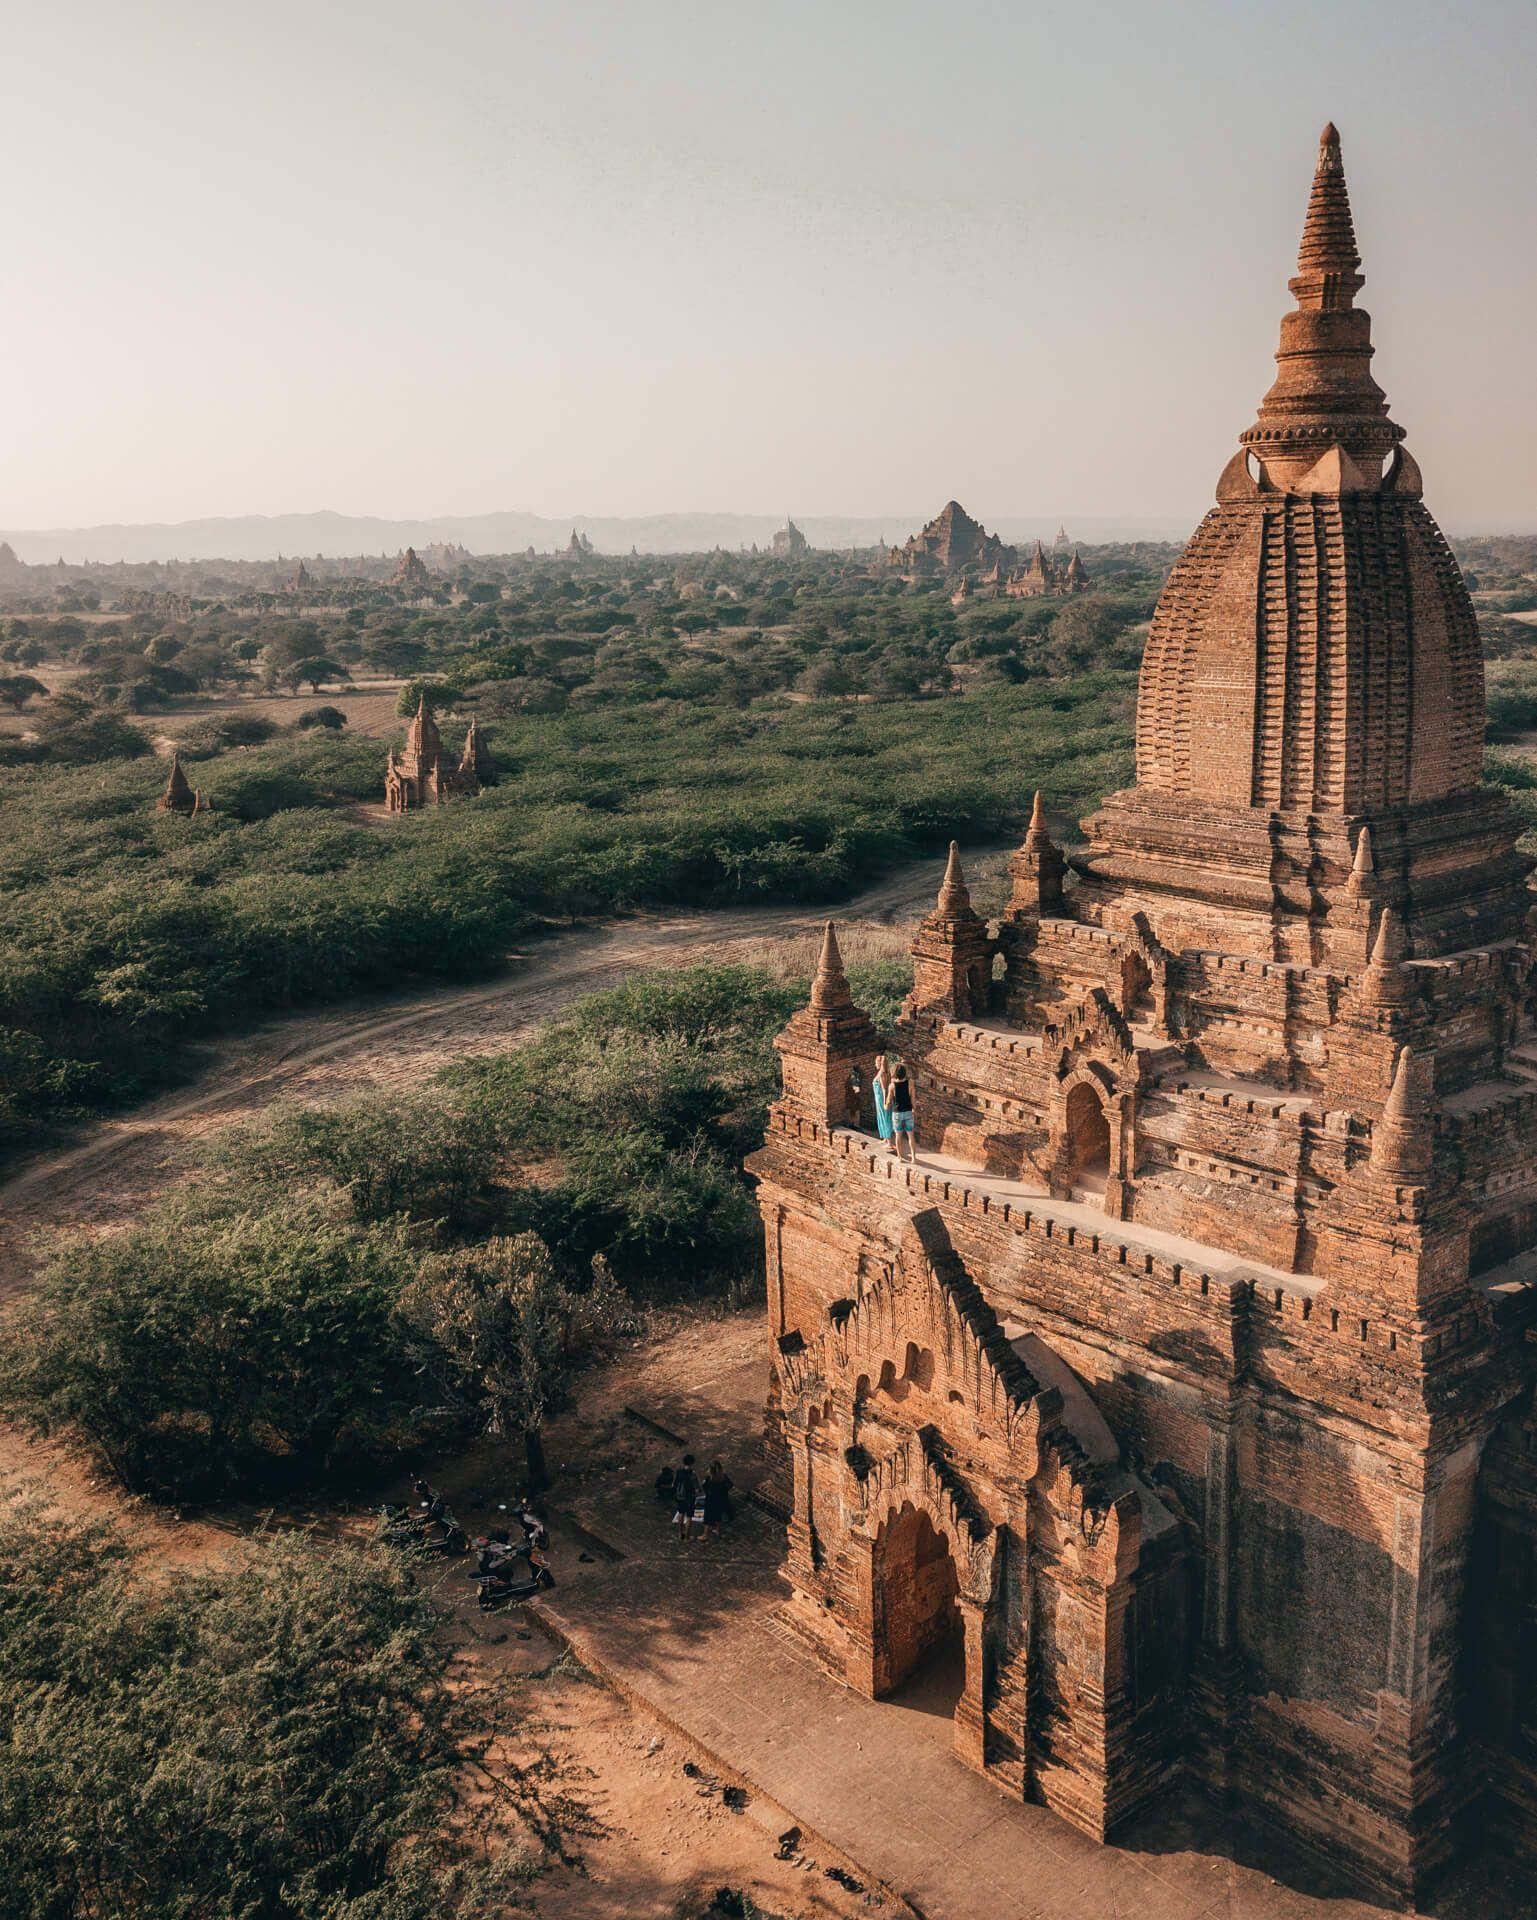 Bagan Myanmar 2019 Ultimate Guide To Bagan Myanmar With Images